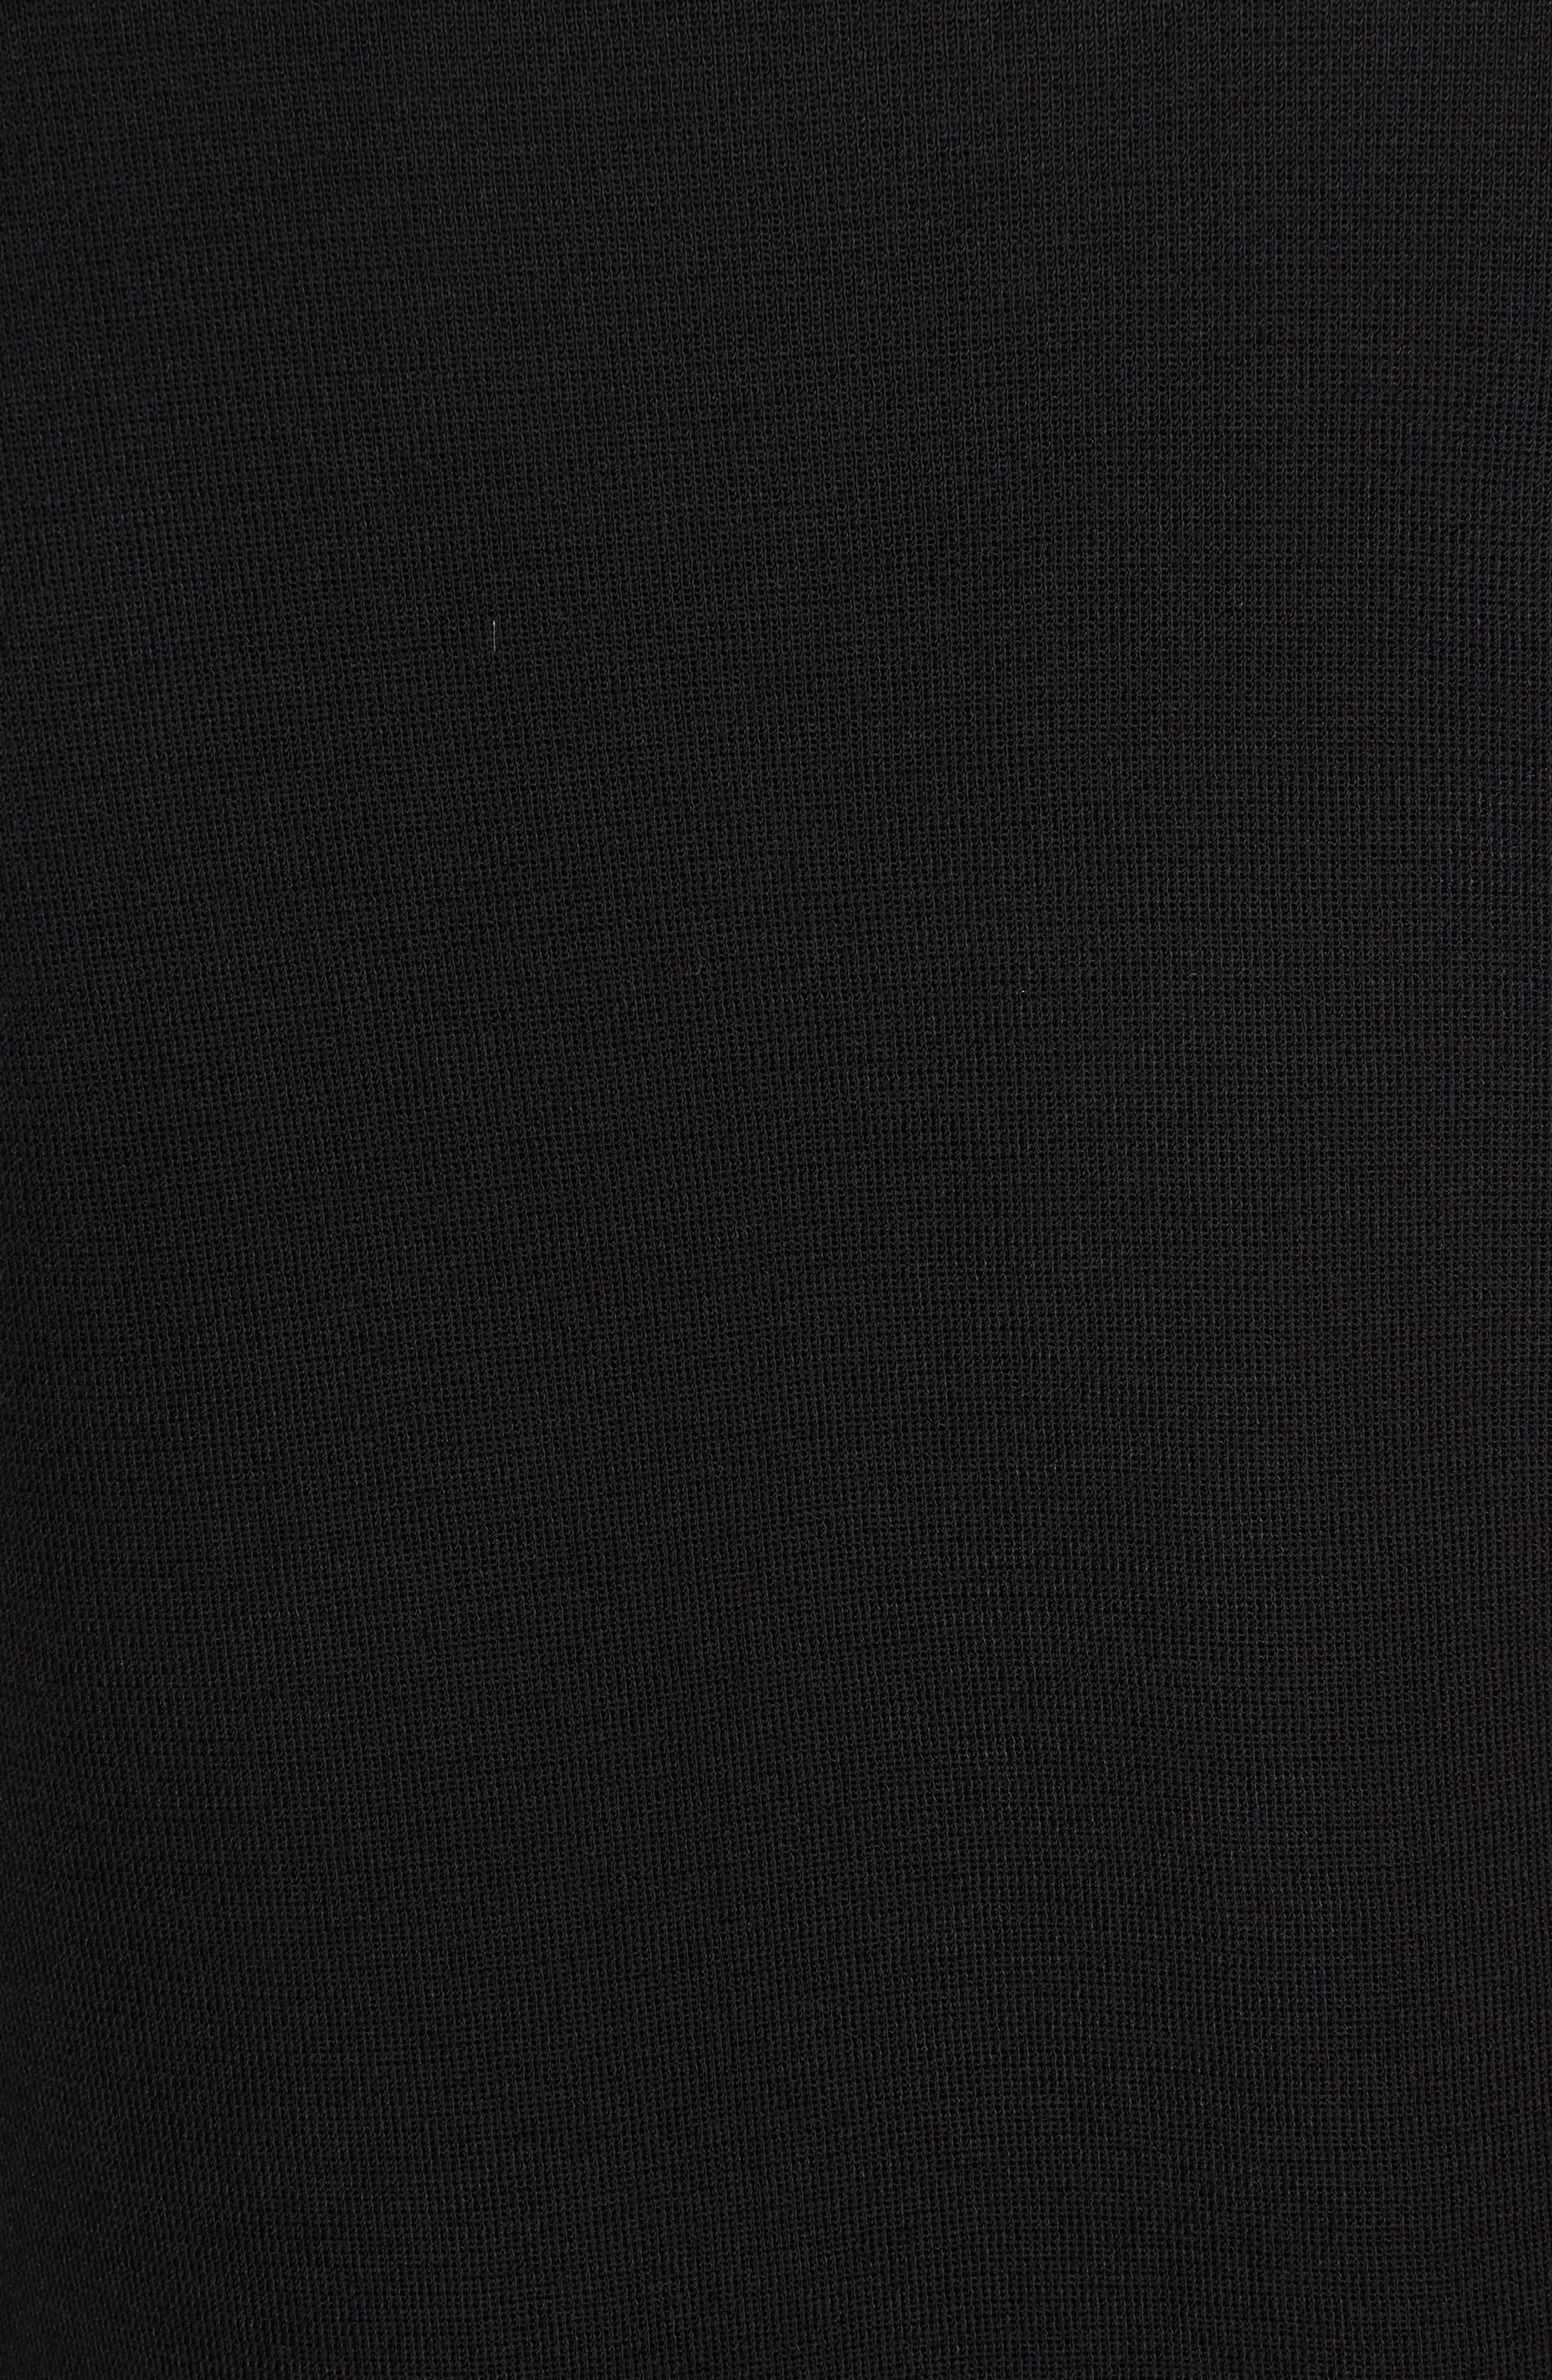 Short Sleeve Dress,                             Alternate thumbnail 5, color,                             BLACK